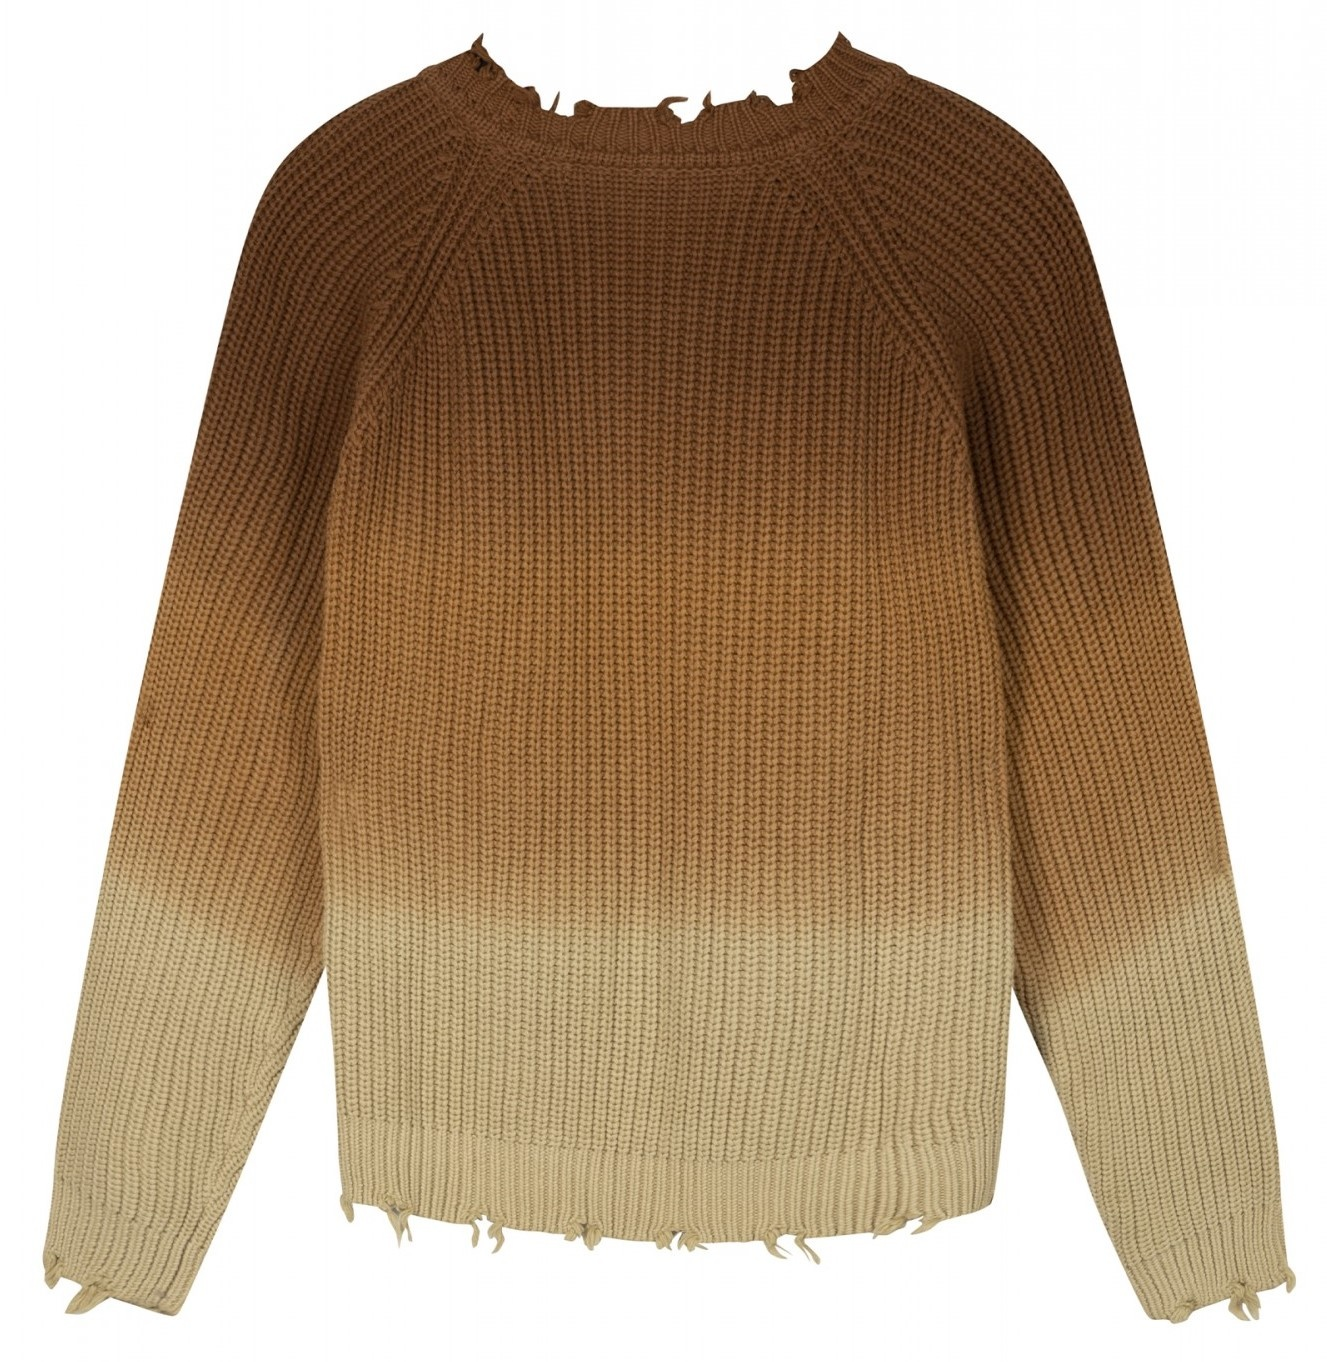 Trui sweater degrade dark caramel-4